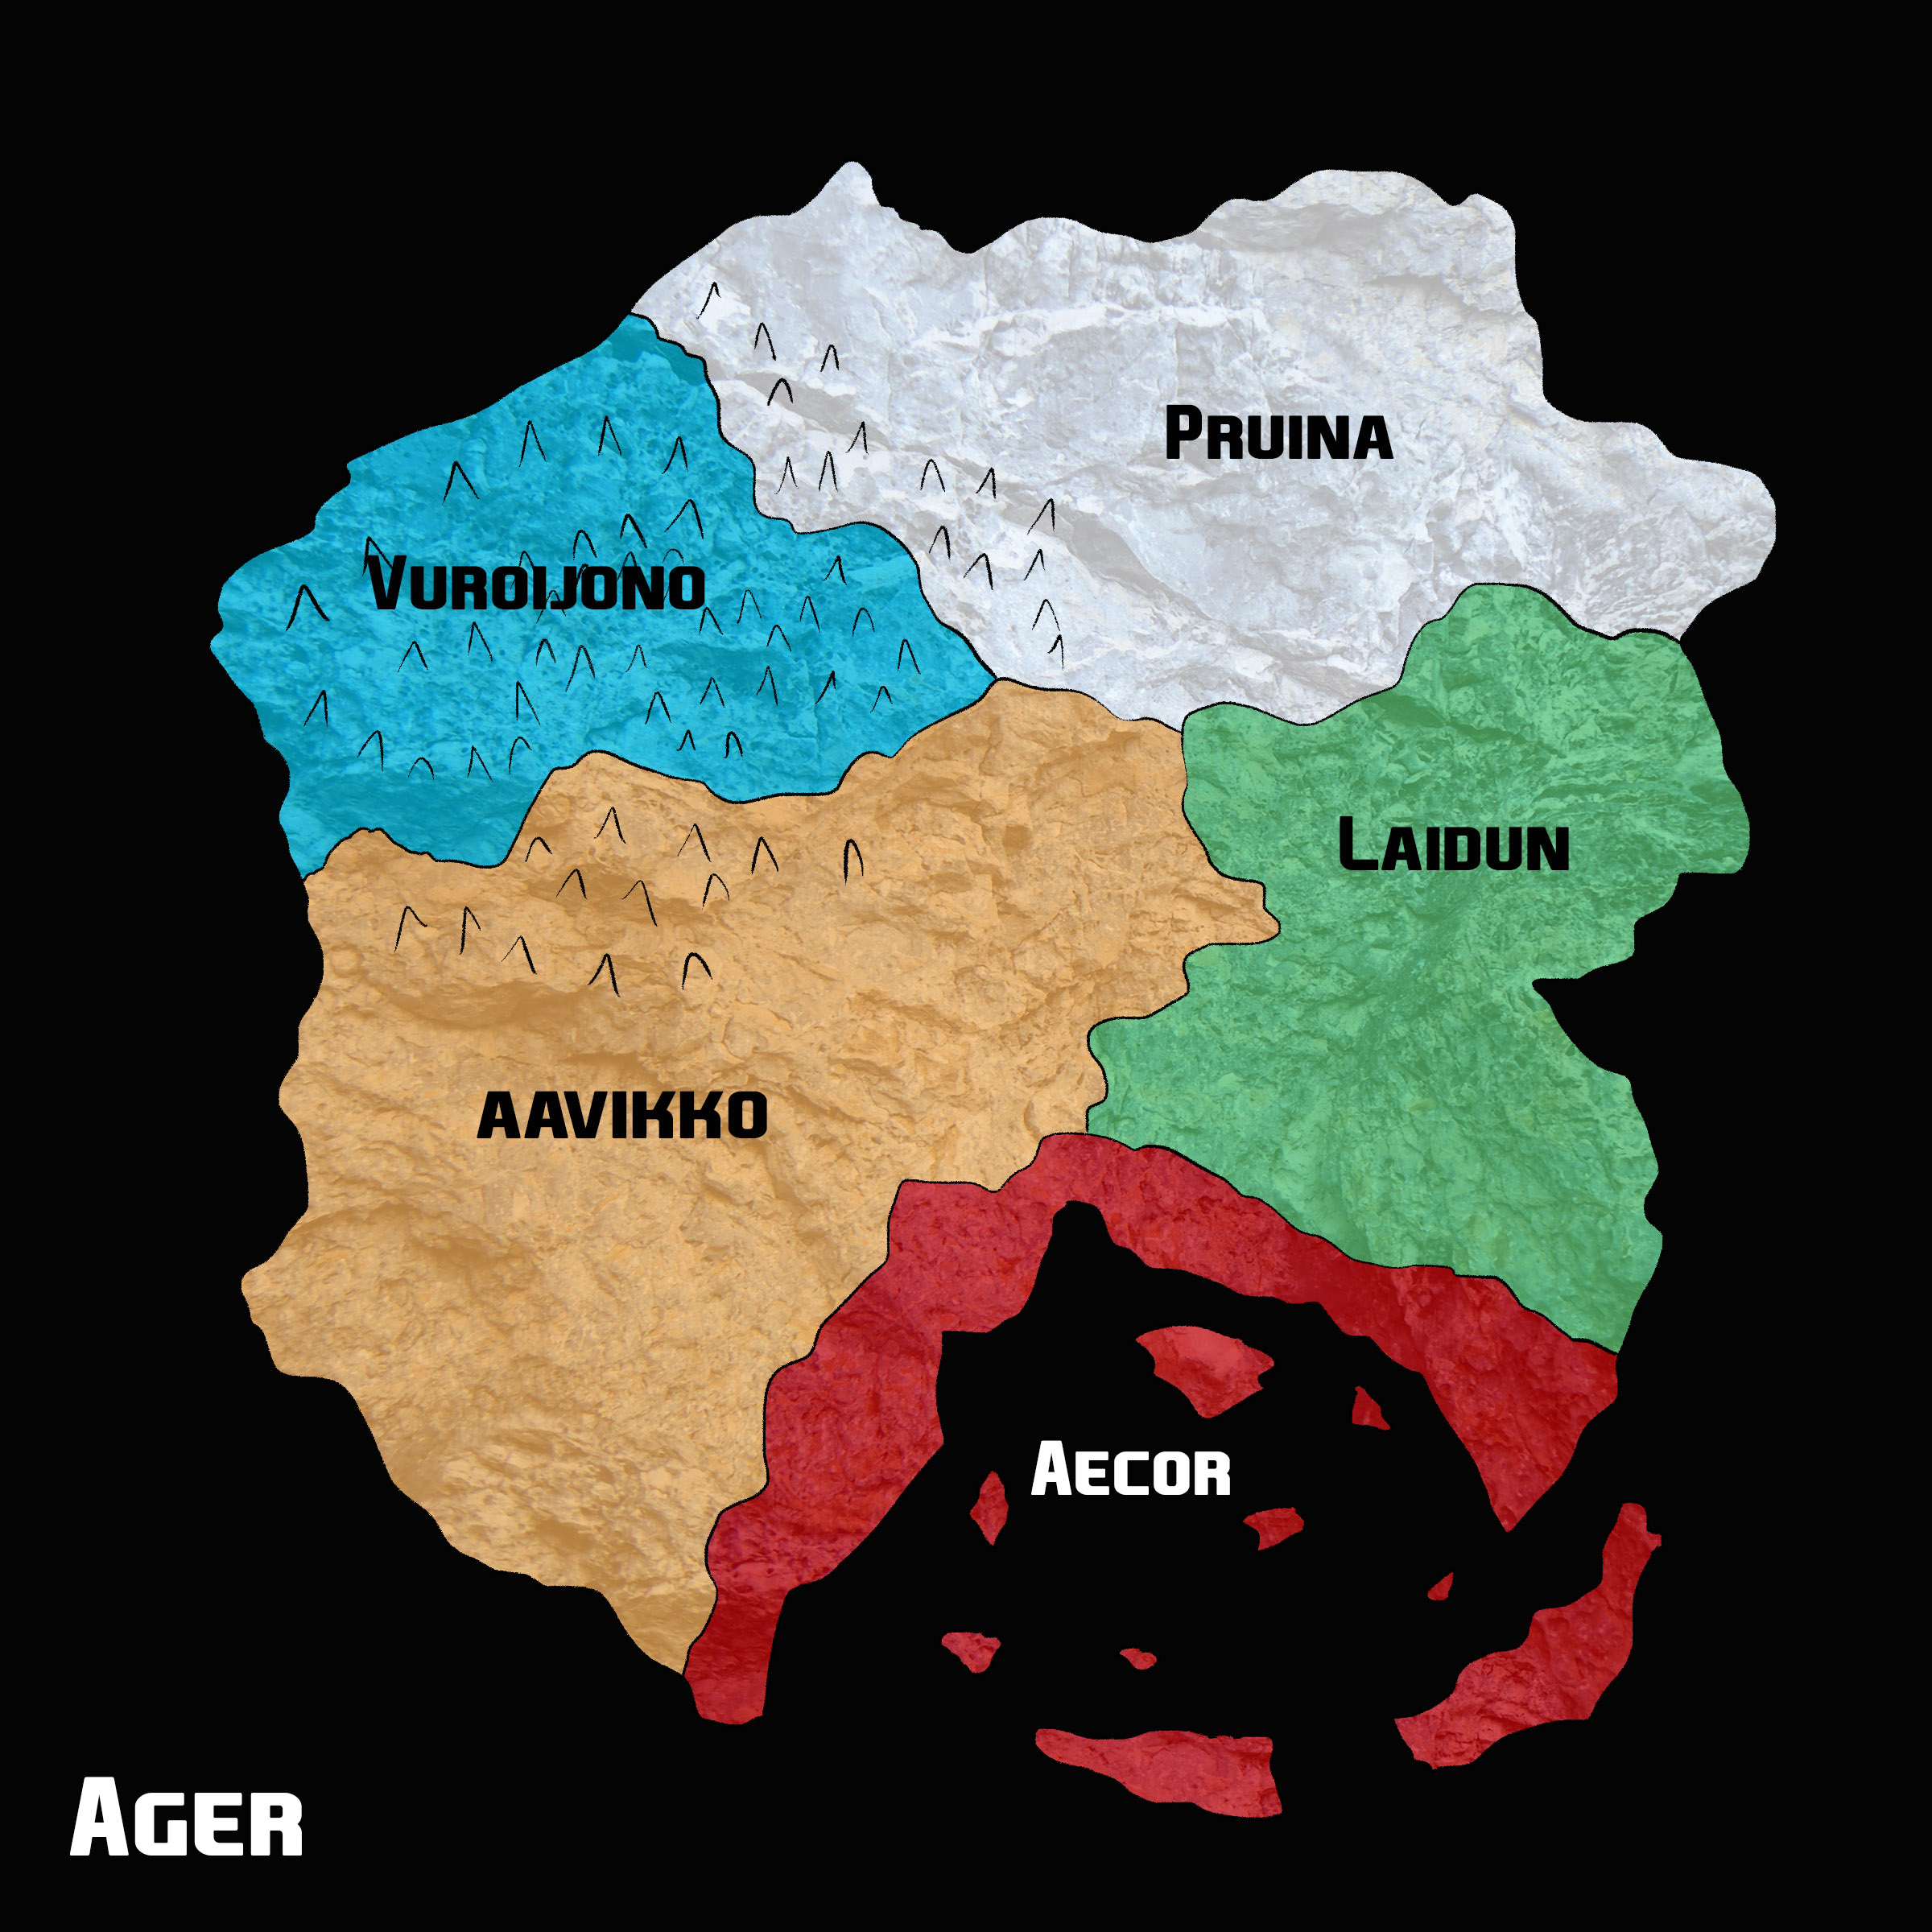 Aecor Map8x8.jpg